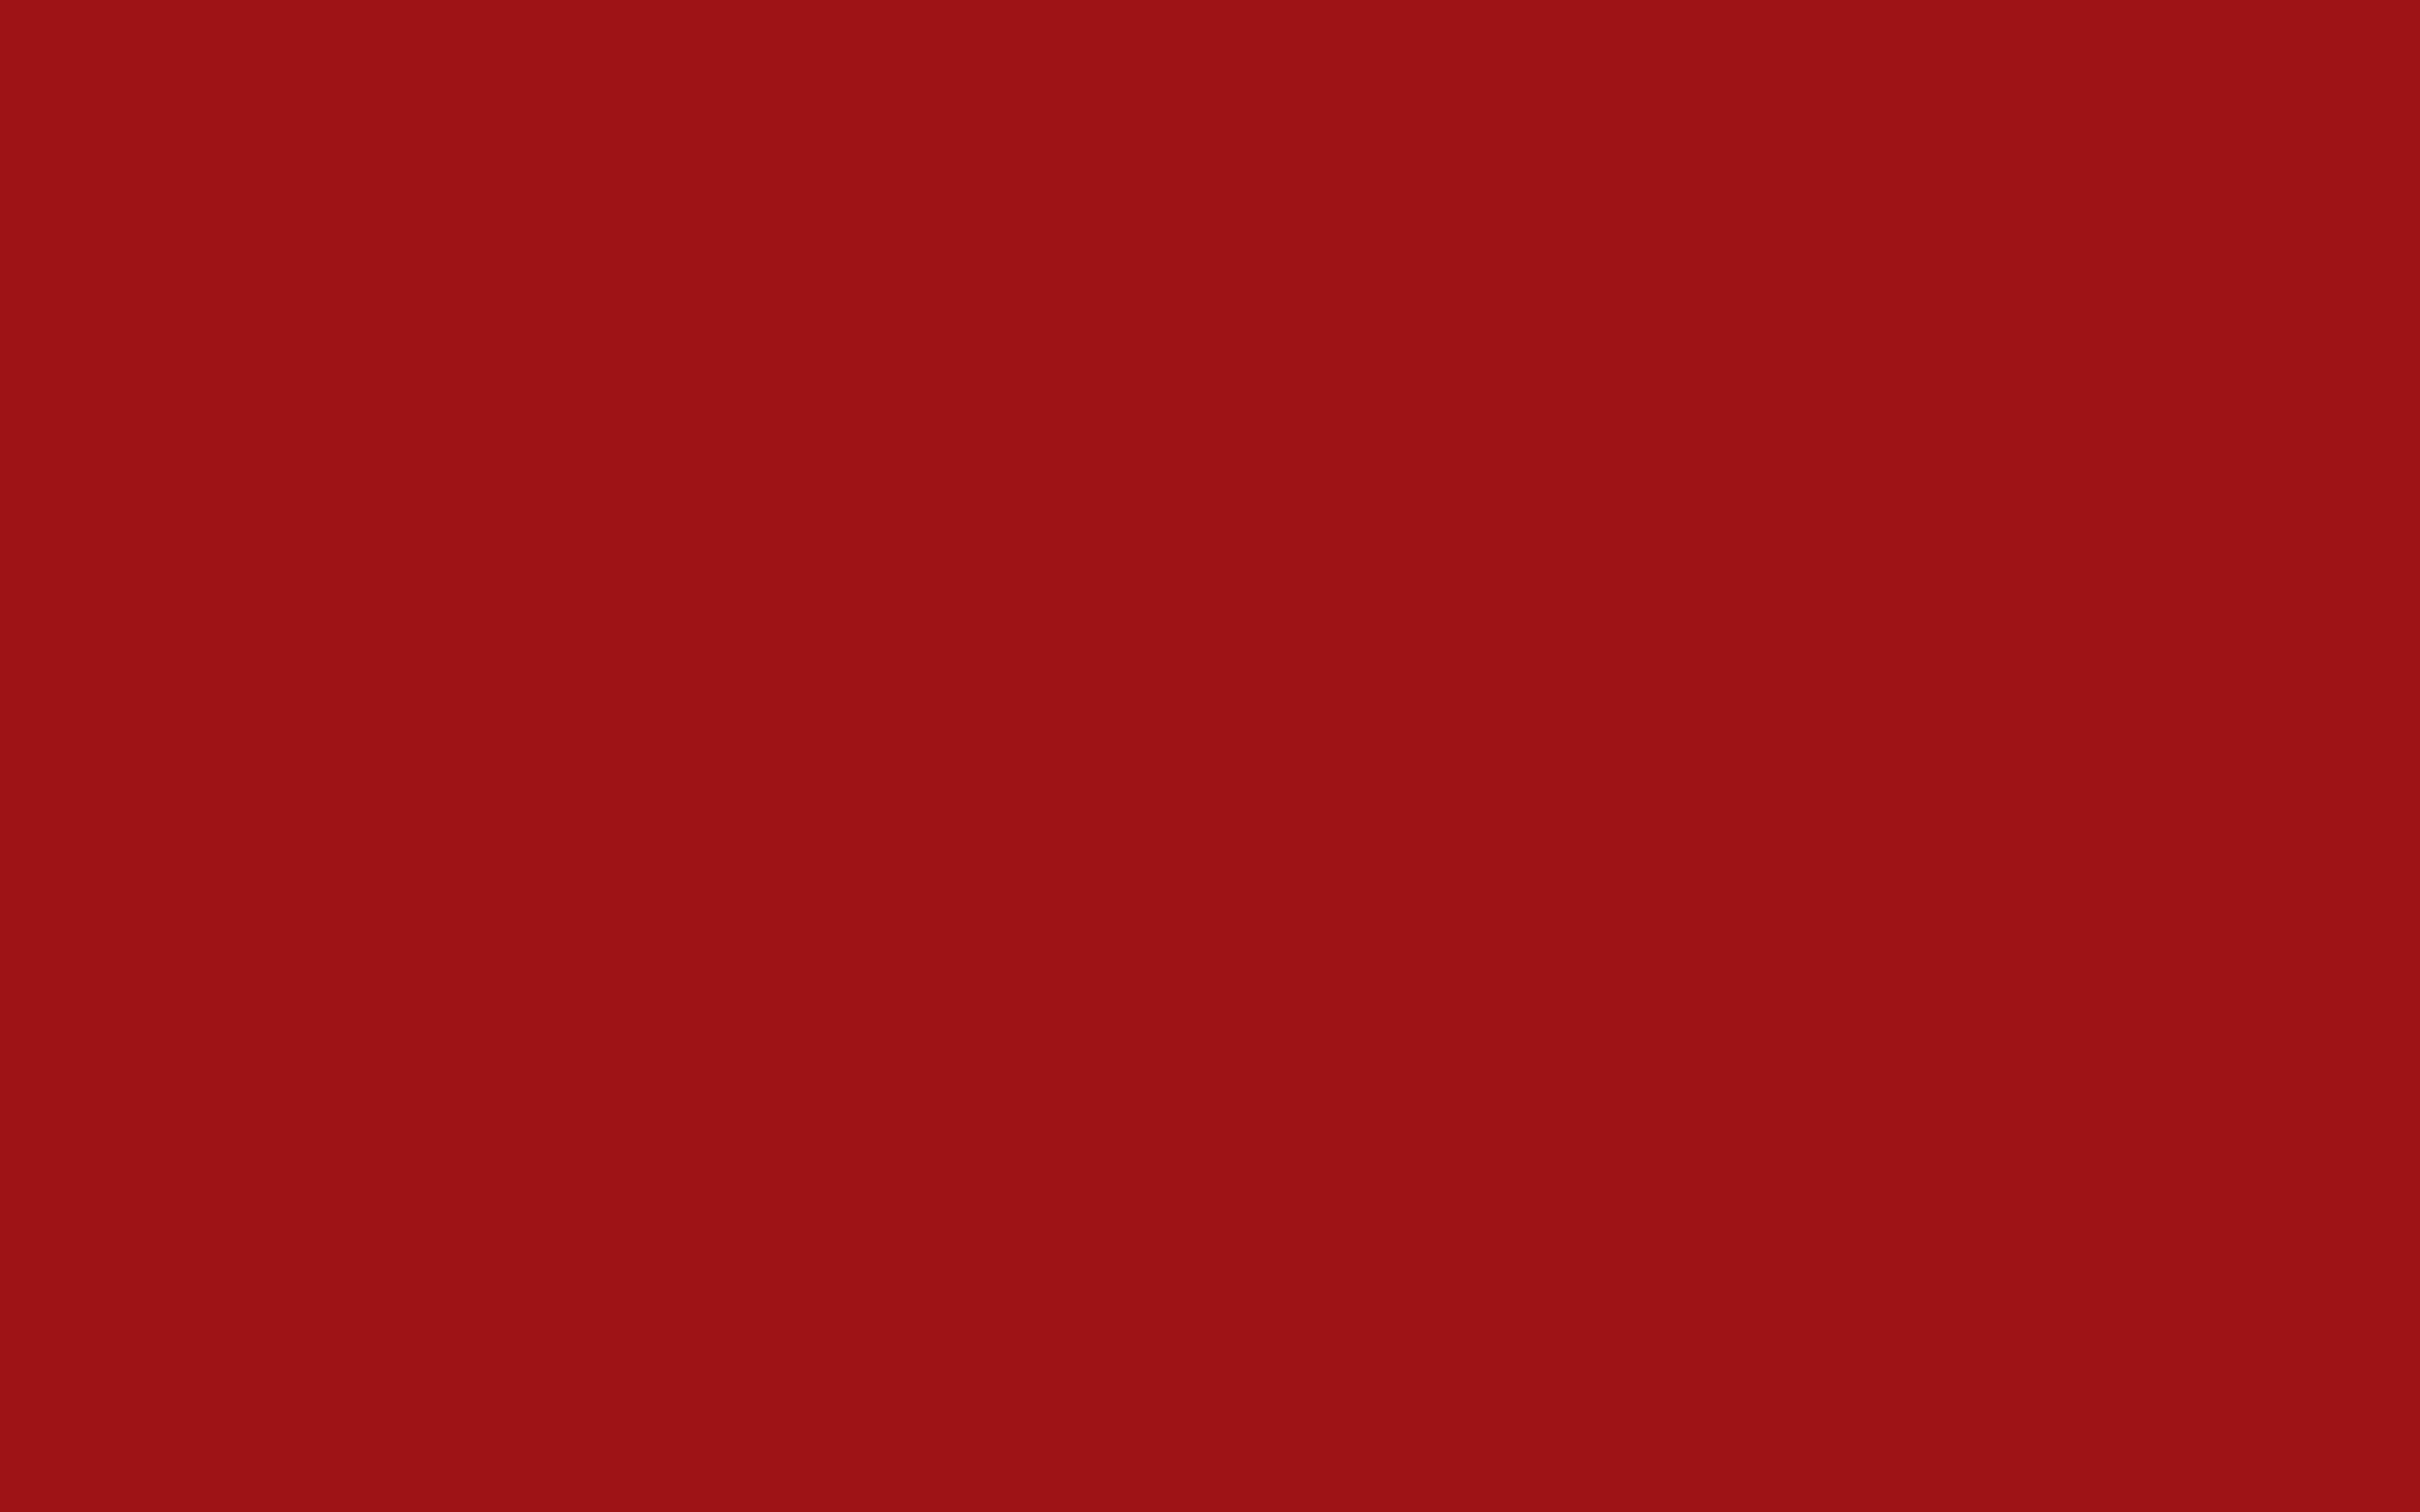 2560x1600 Spartan Crimson Solid Color Background